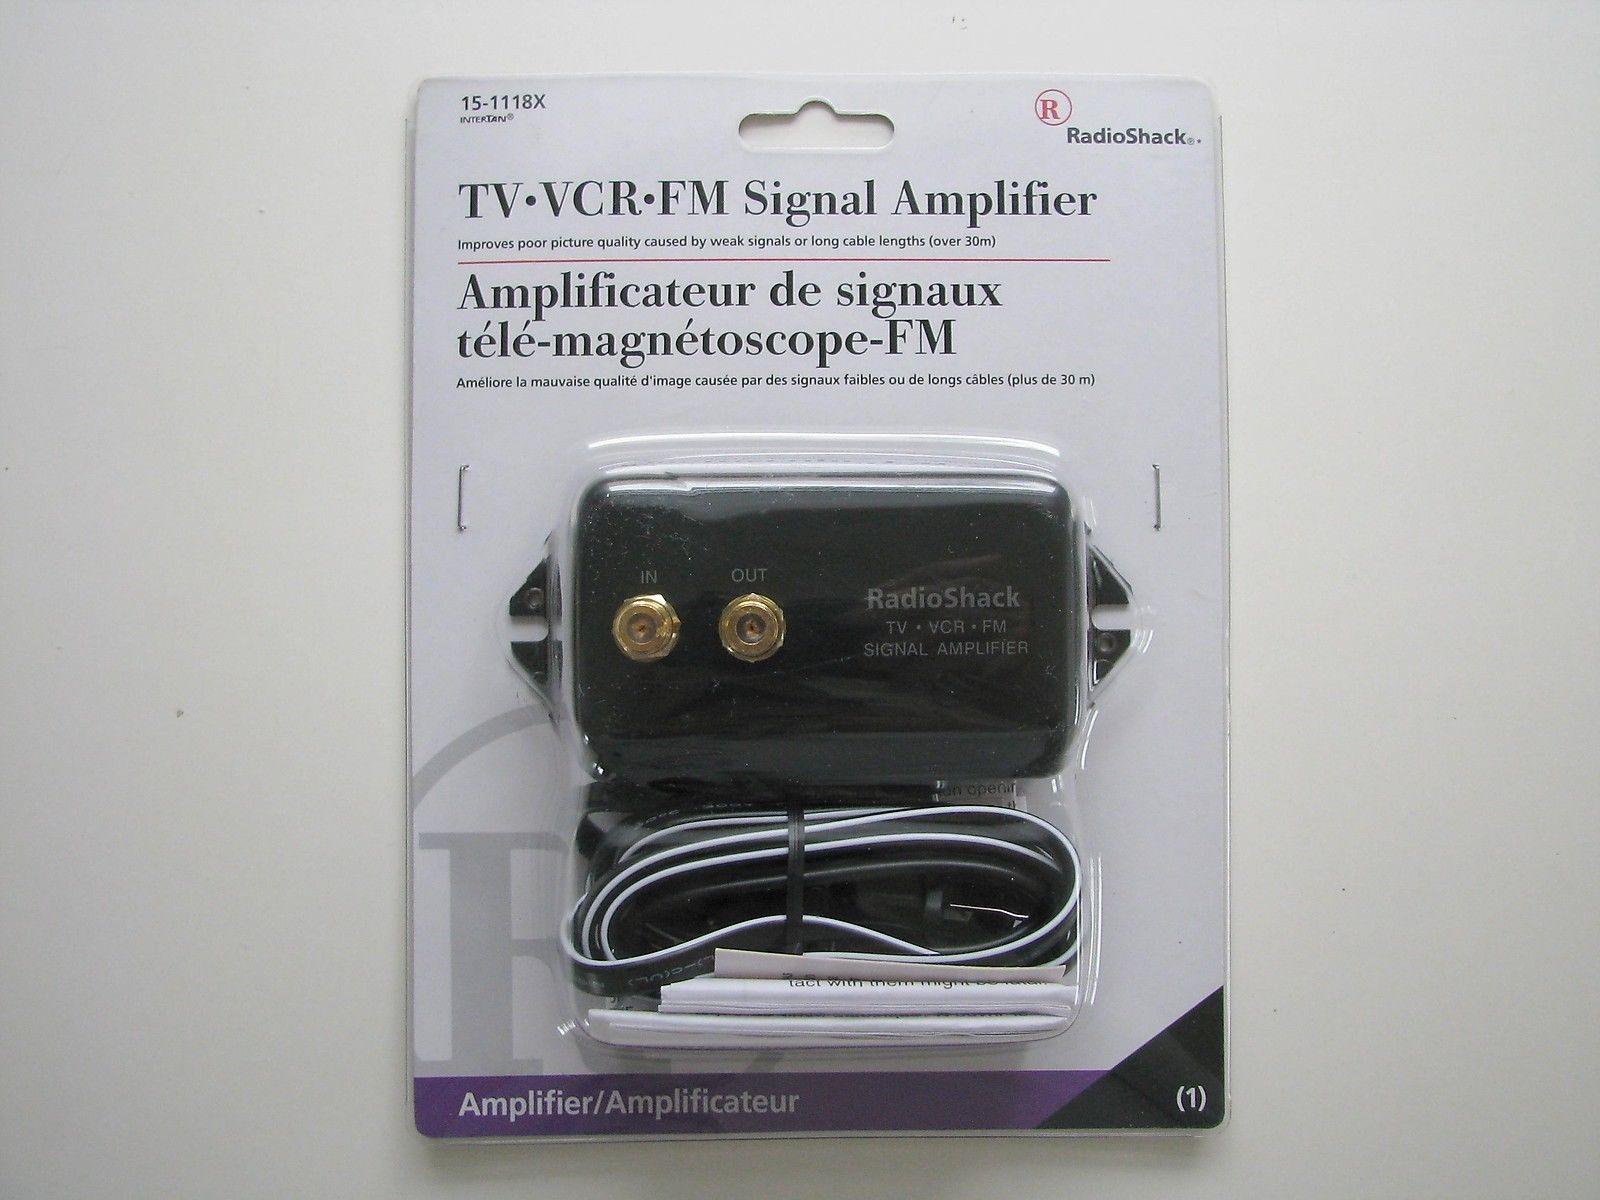 Radio-Shack-Tvvcrfm-Signal-Amplifier-15-1118X.jpg